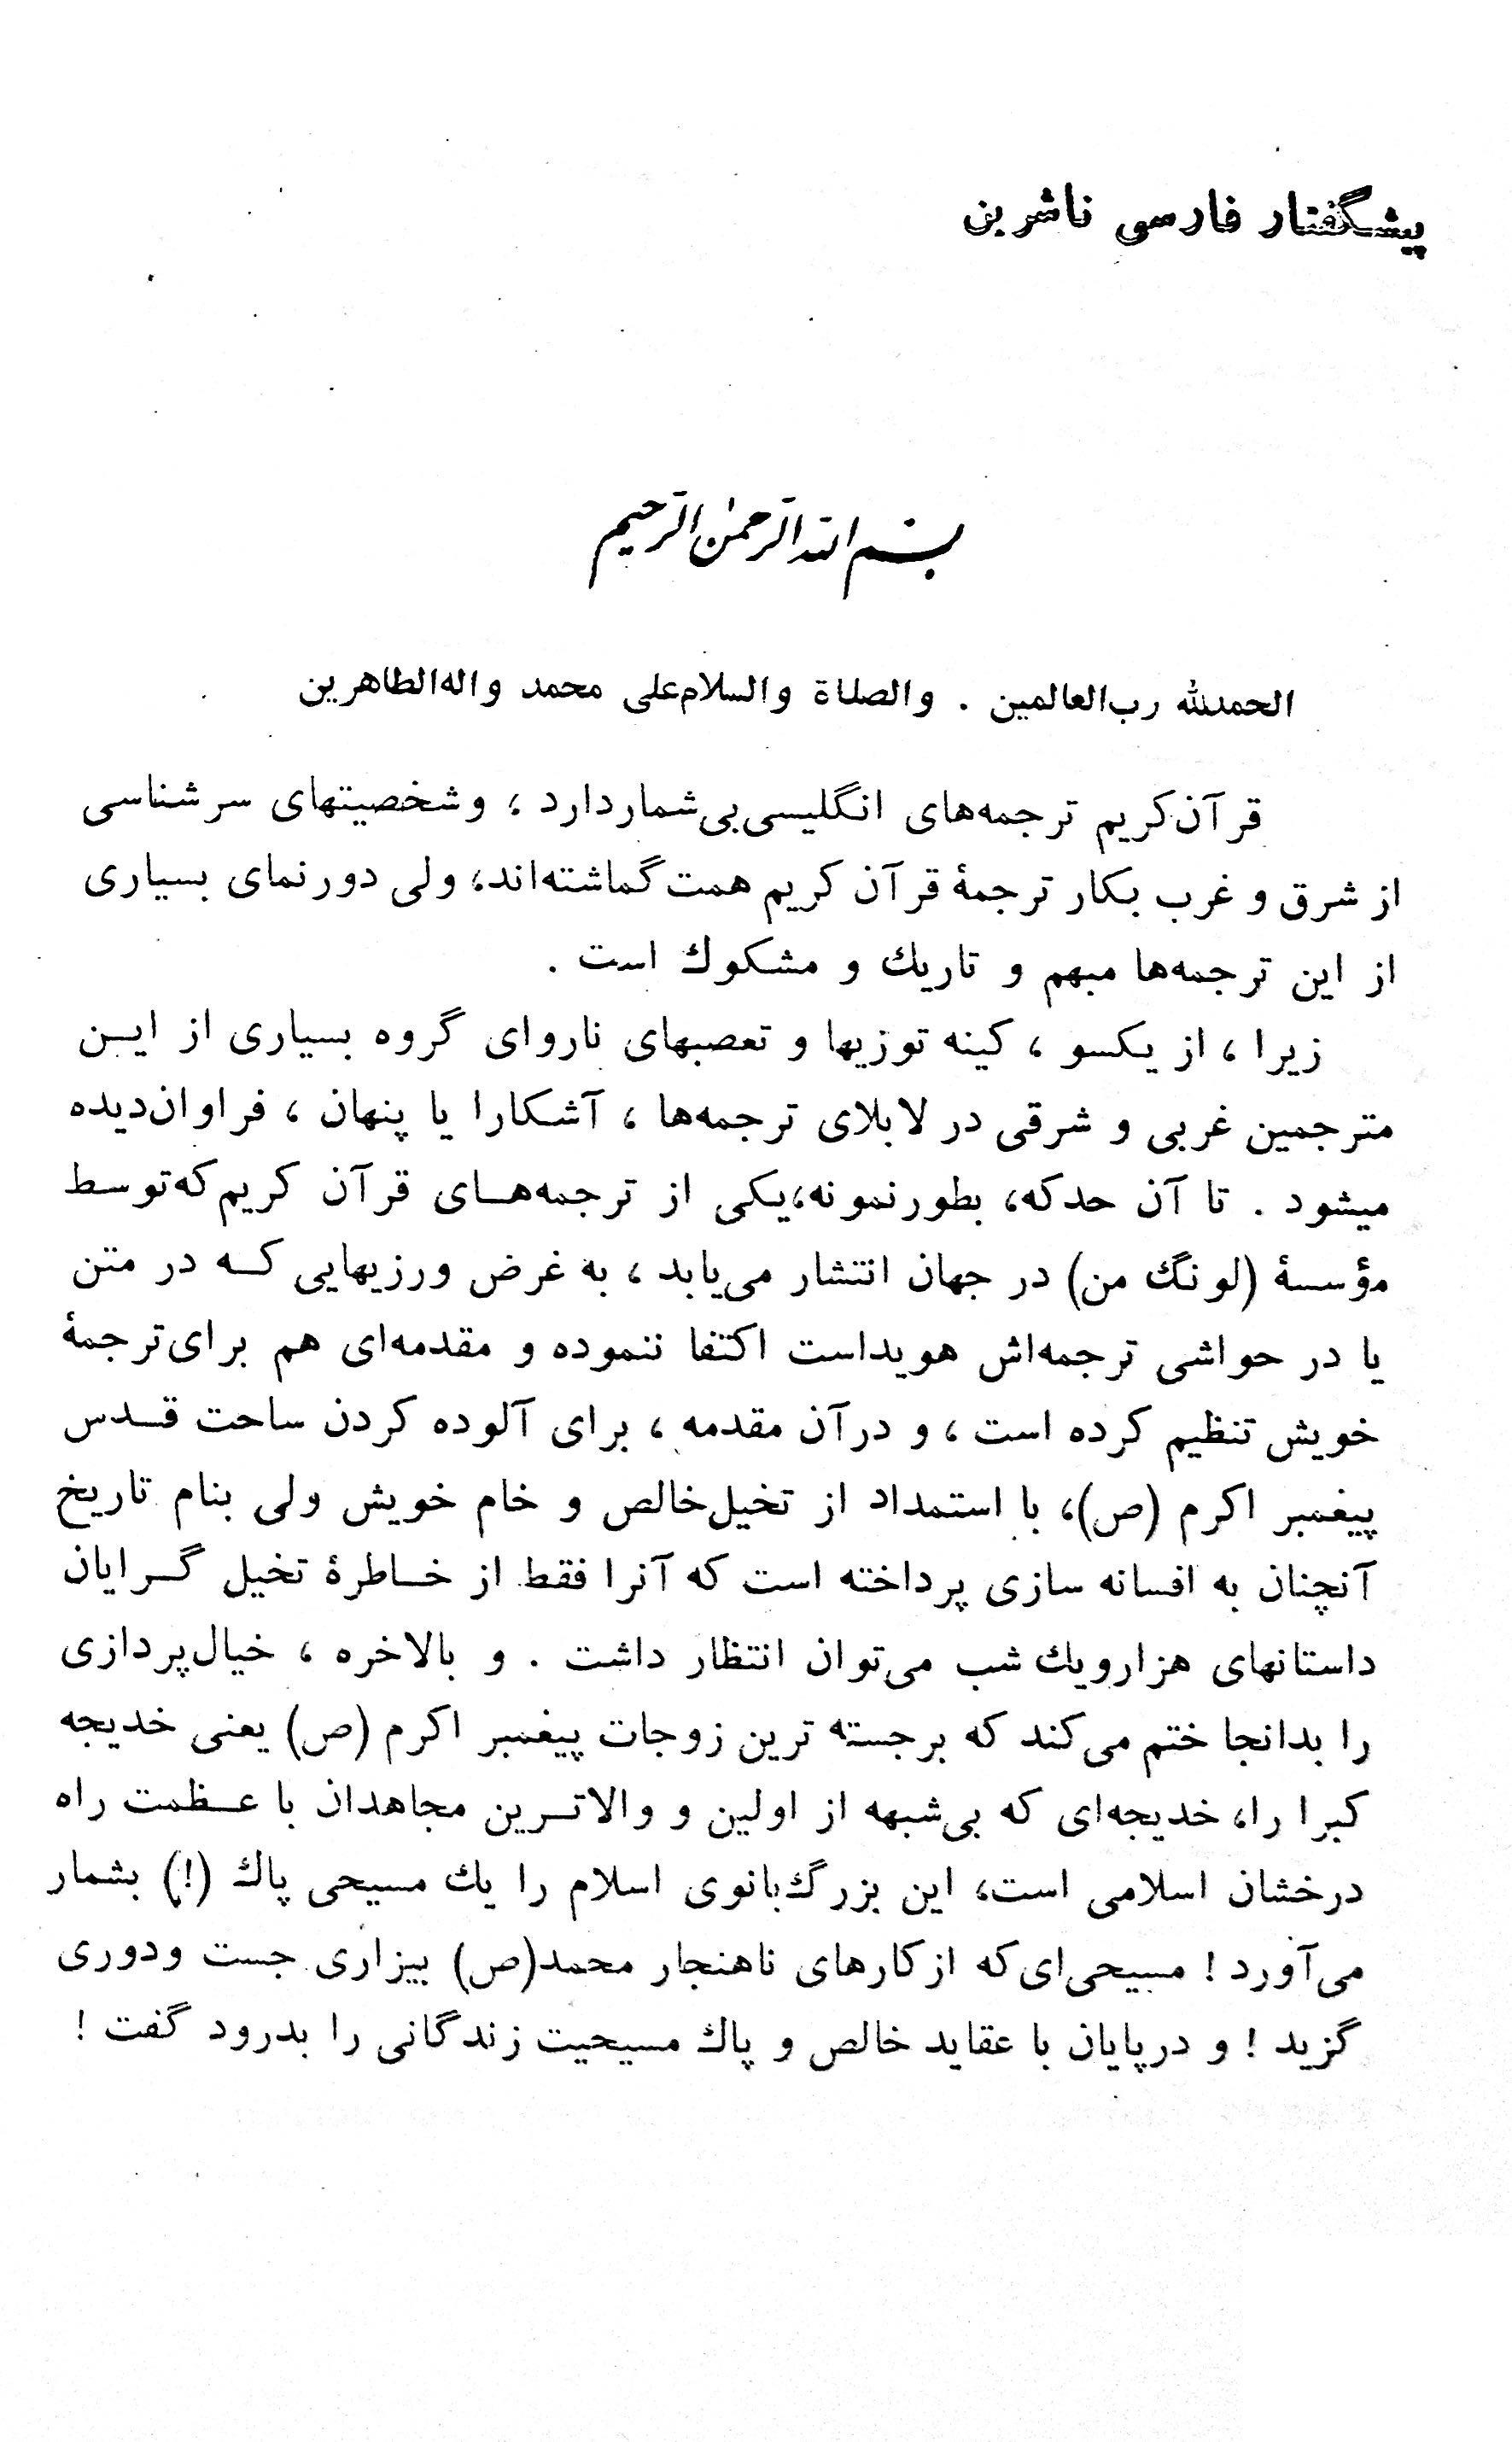 M. H. Shakir 1974 Quran Explorer, Page 2